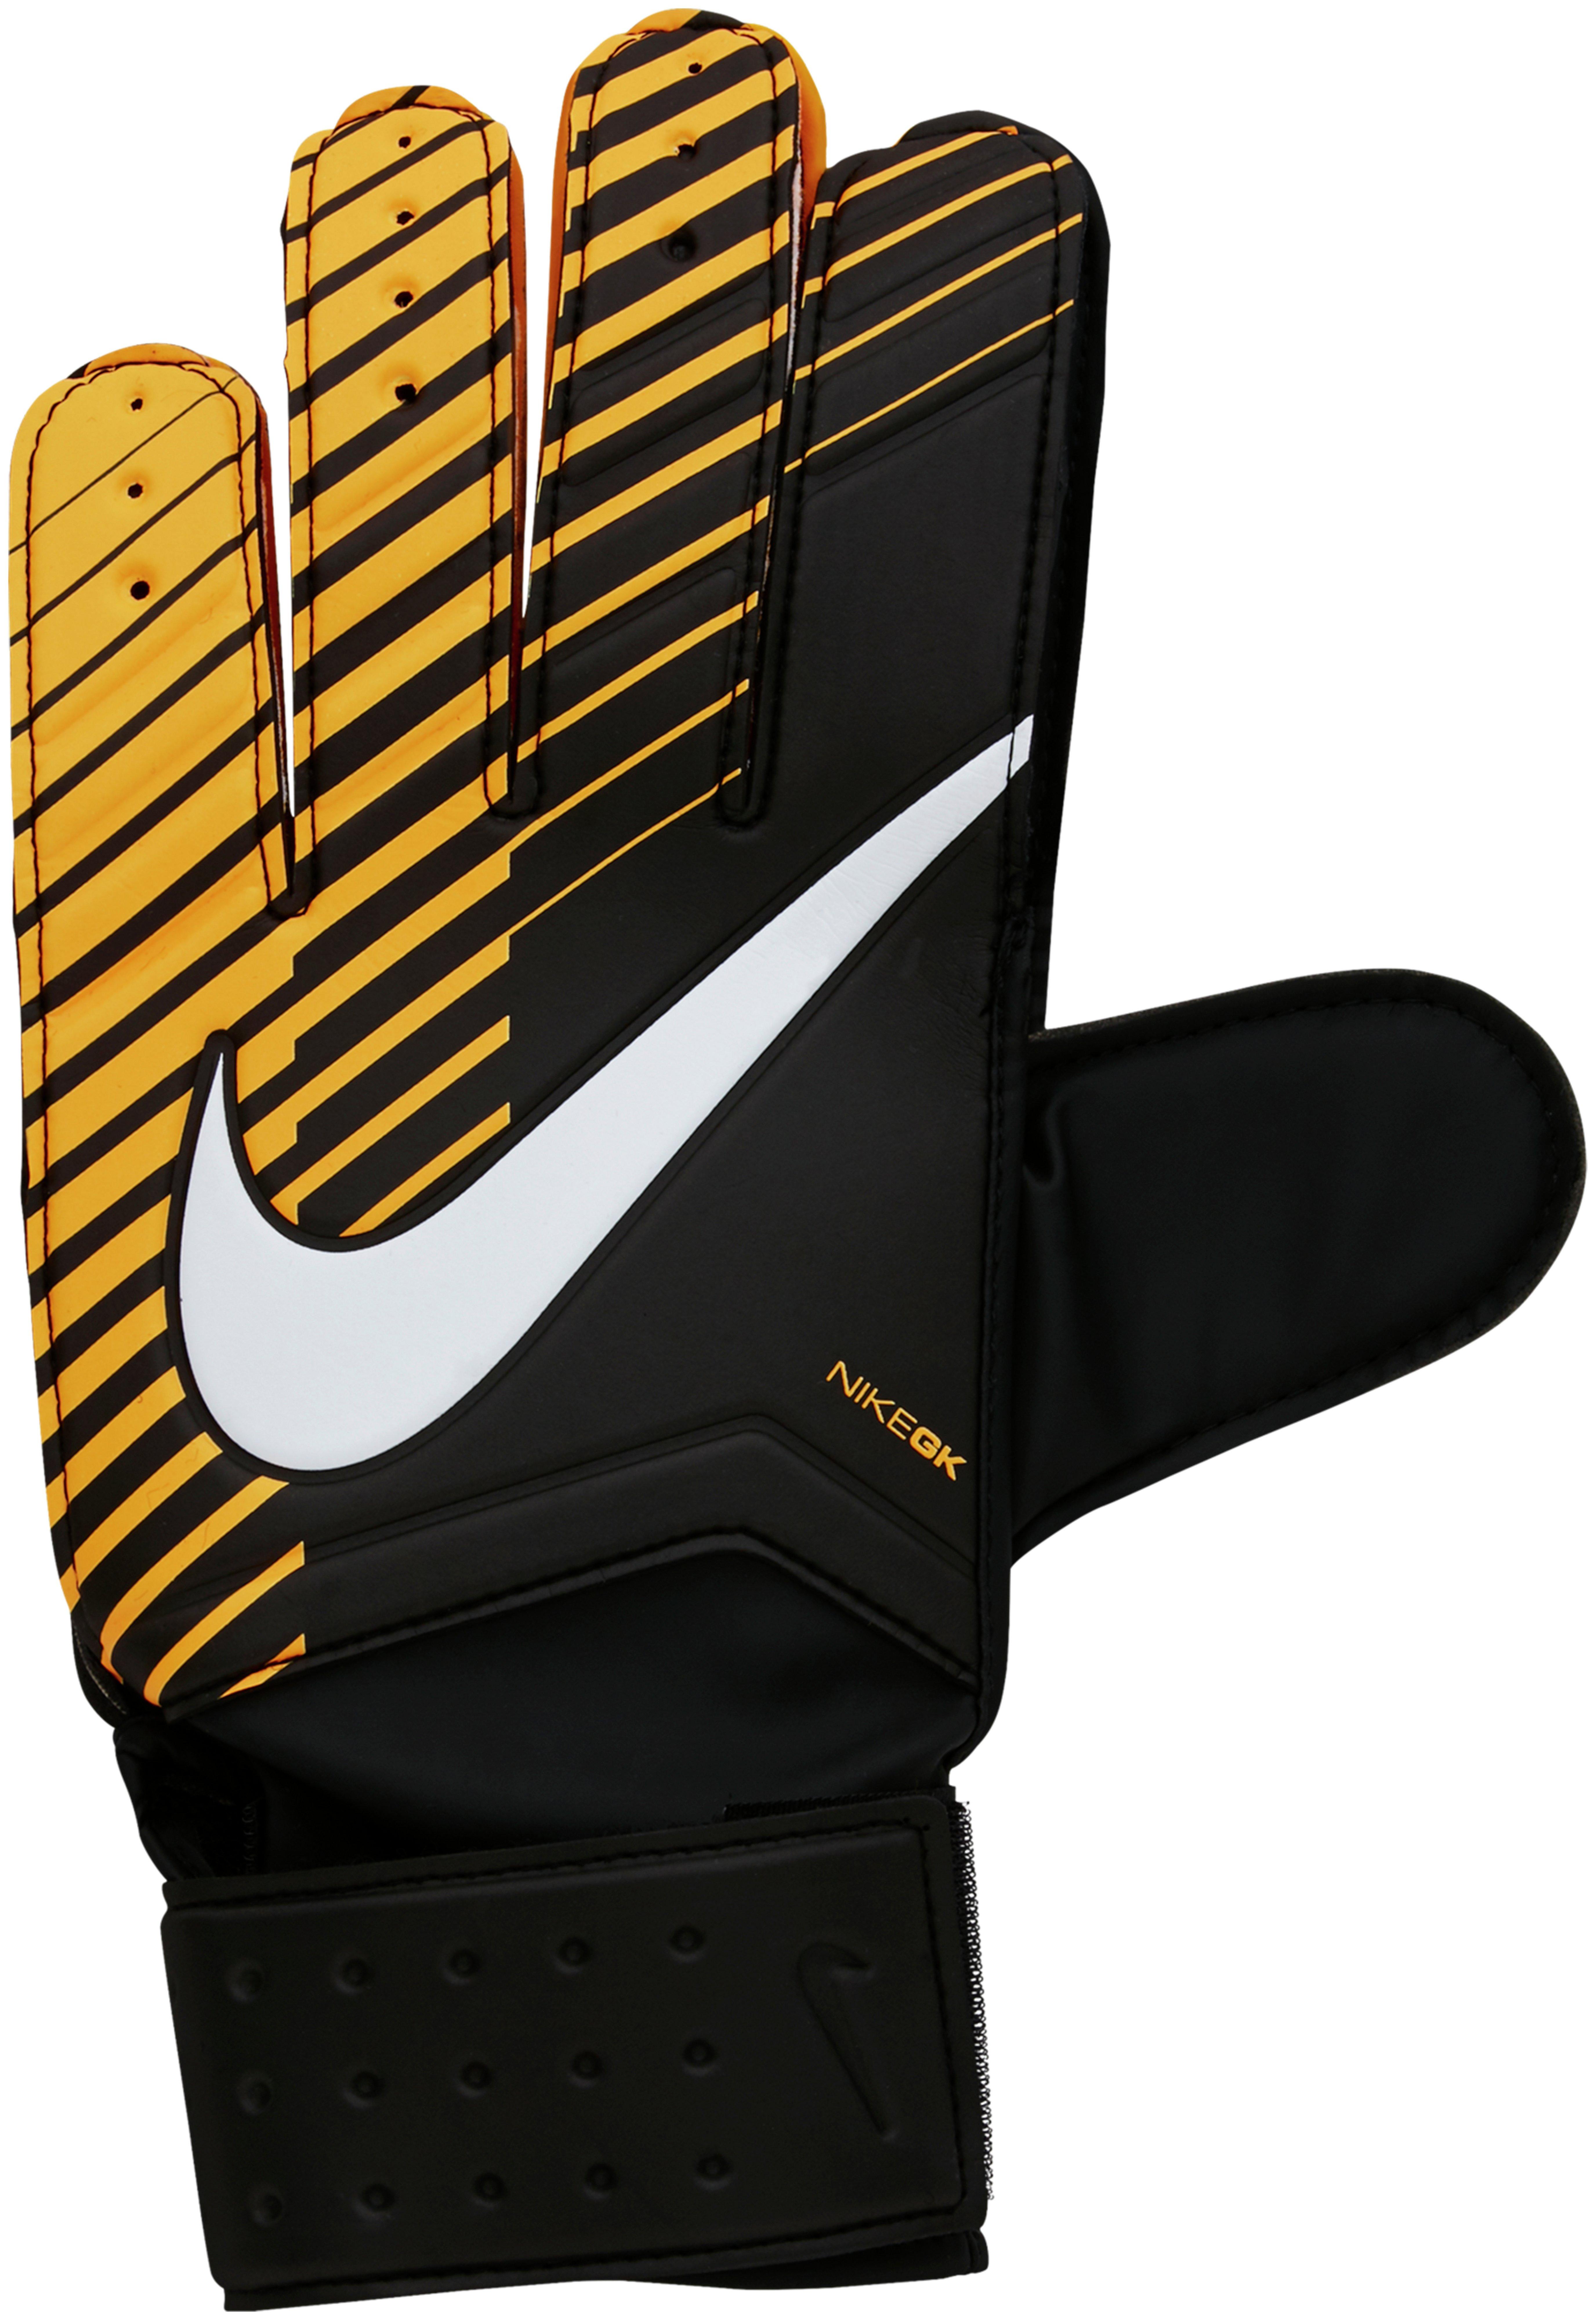 Unisex Nike Match Goalkeeper Football Gloves